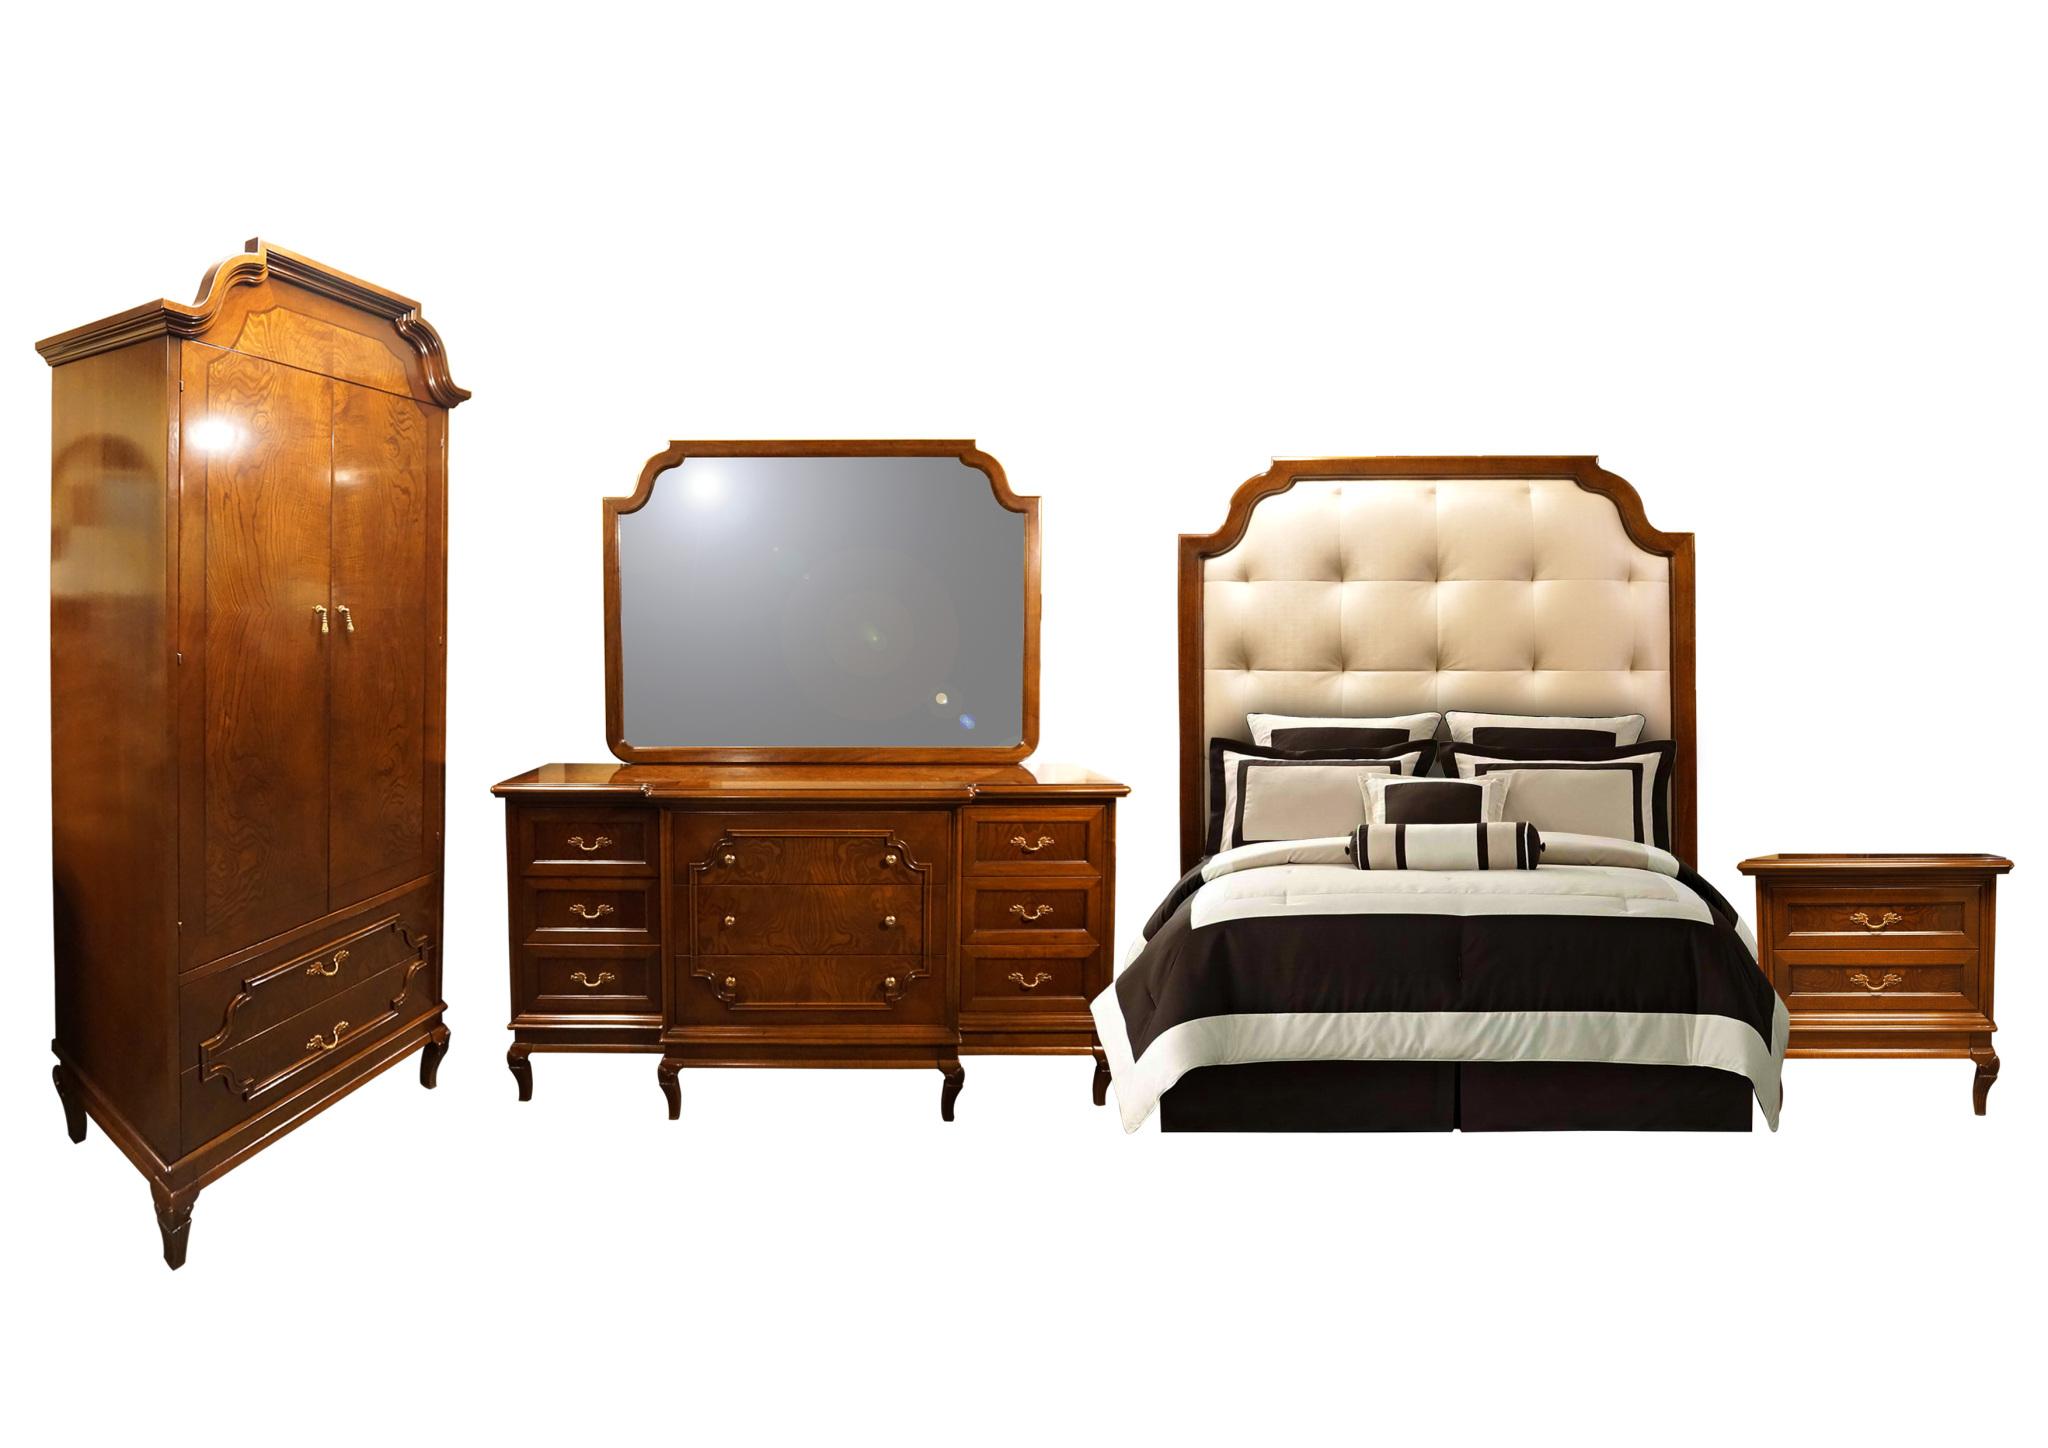 Verona Complete Bedroom Set Complete Bedroom Sets For Sale Brooklyn Accentuations Brand